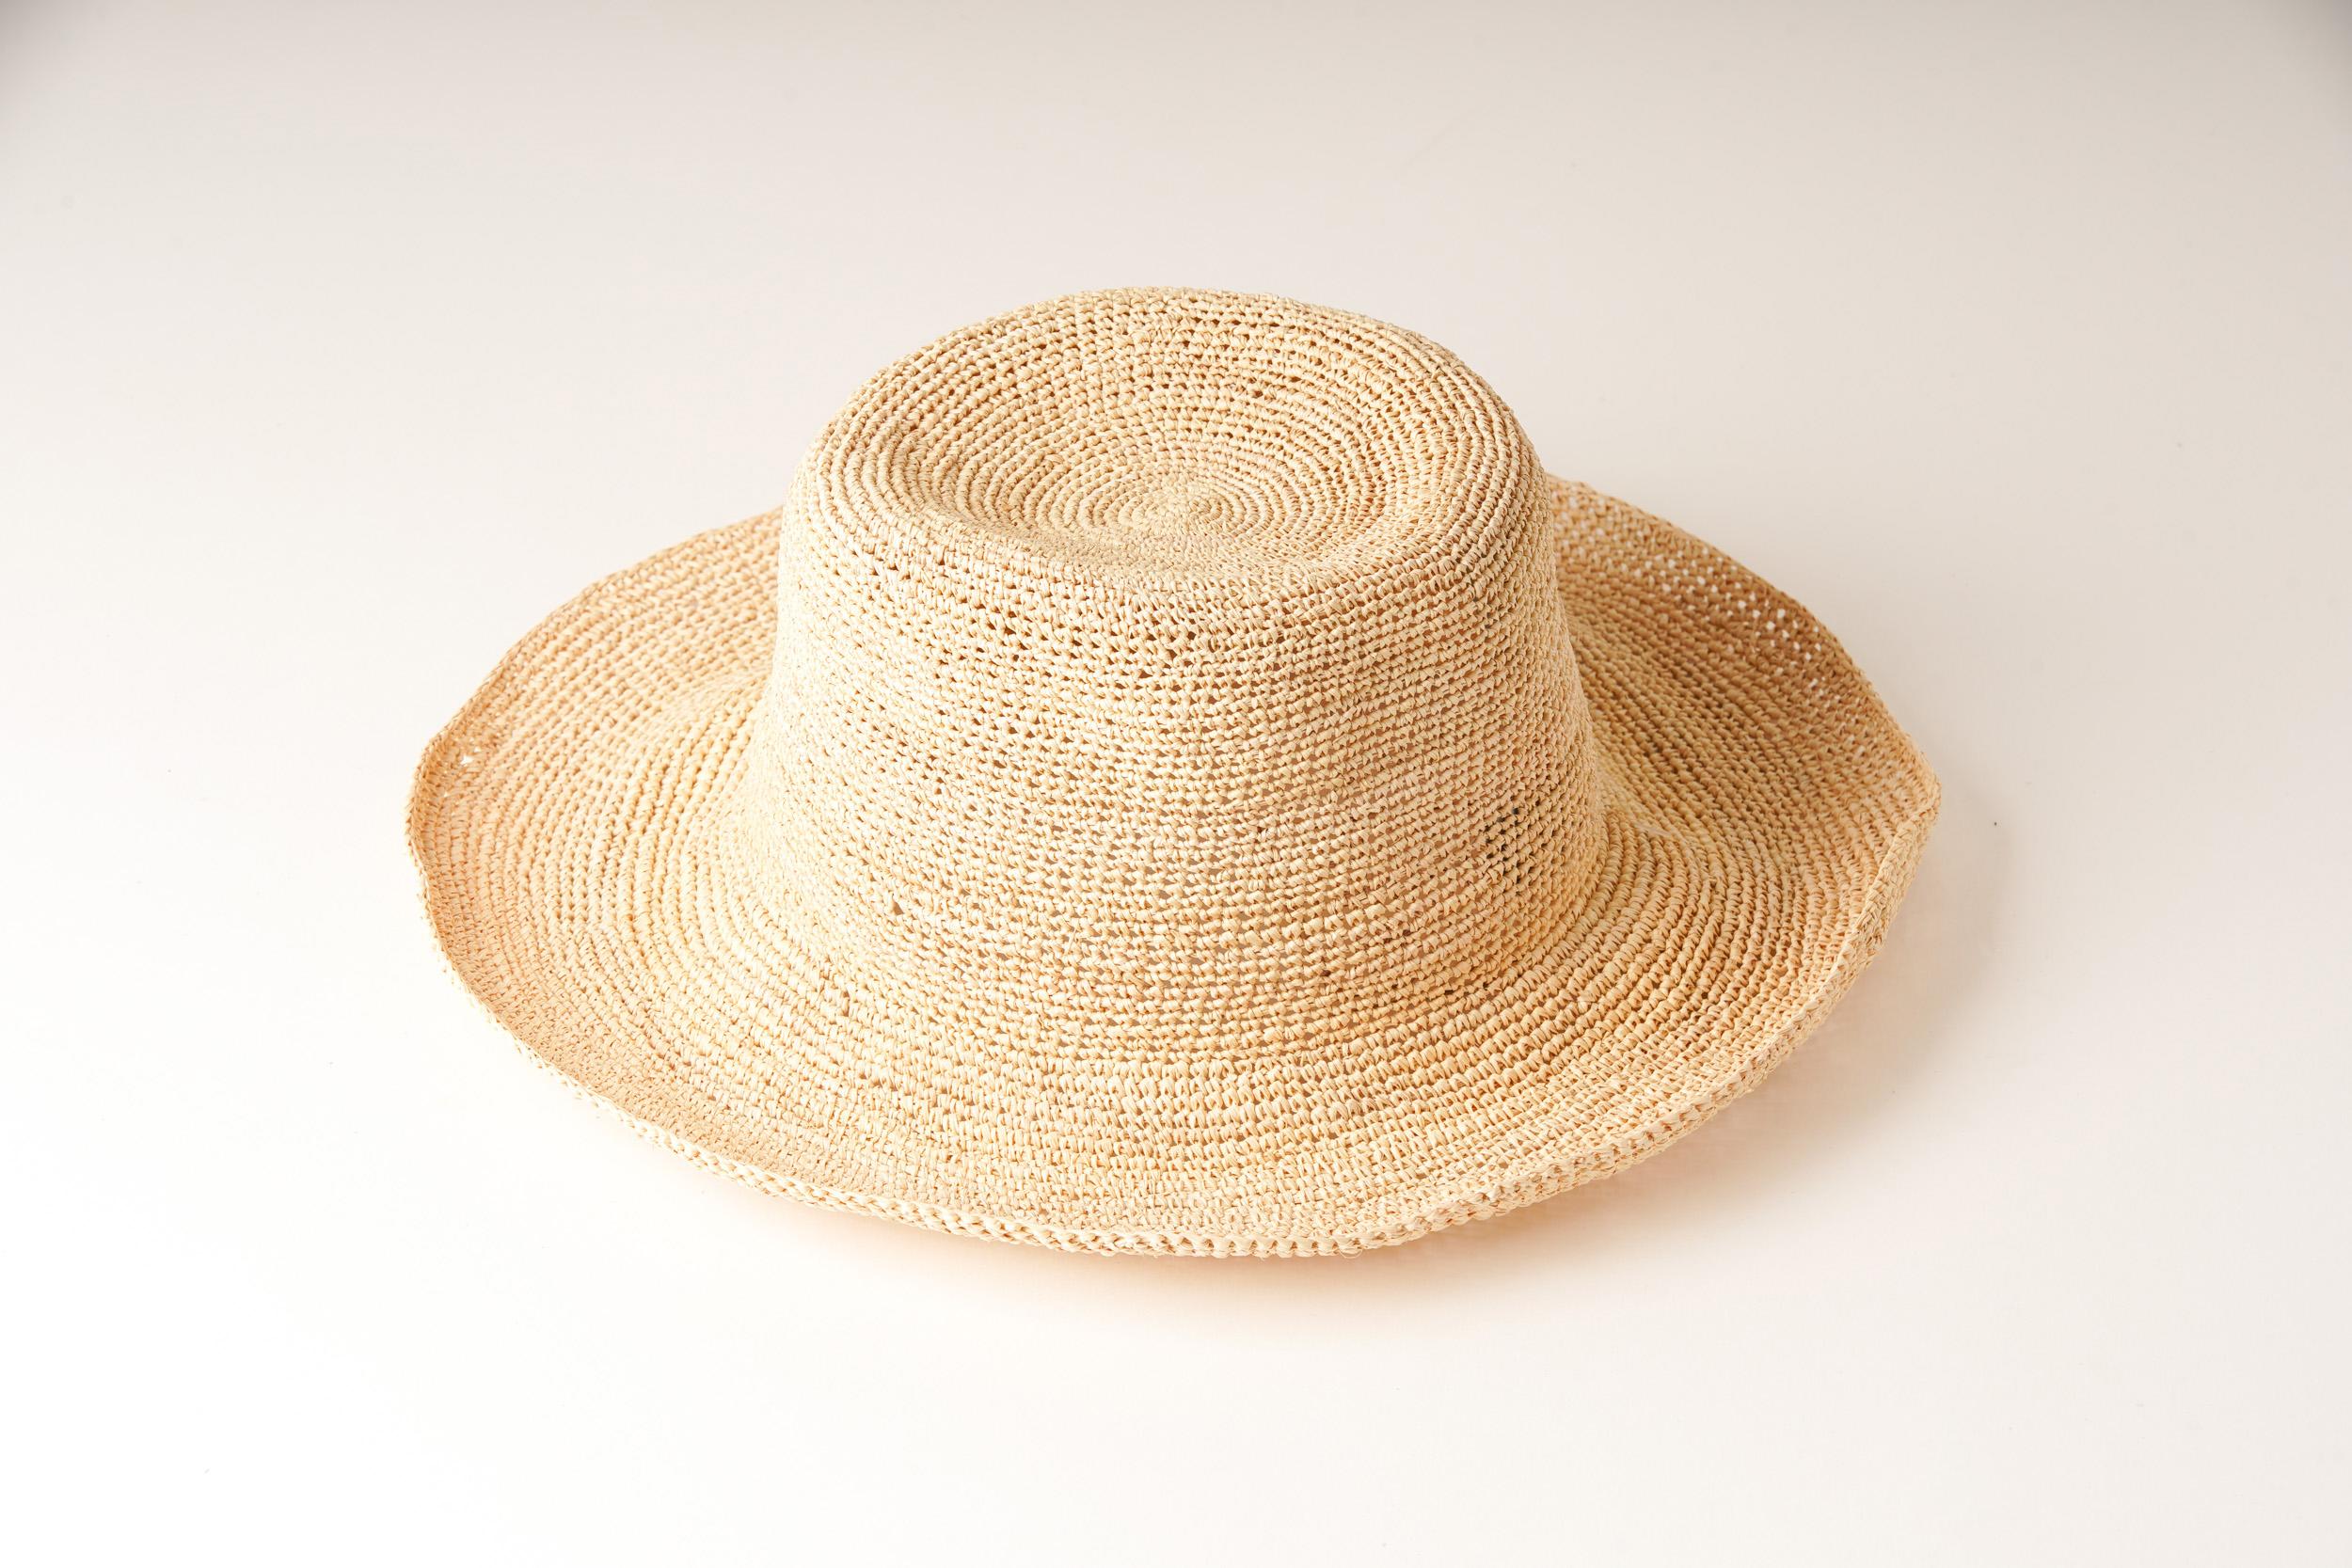 Ecua-Andinoの帽子販売店に卸